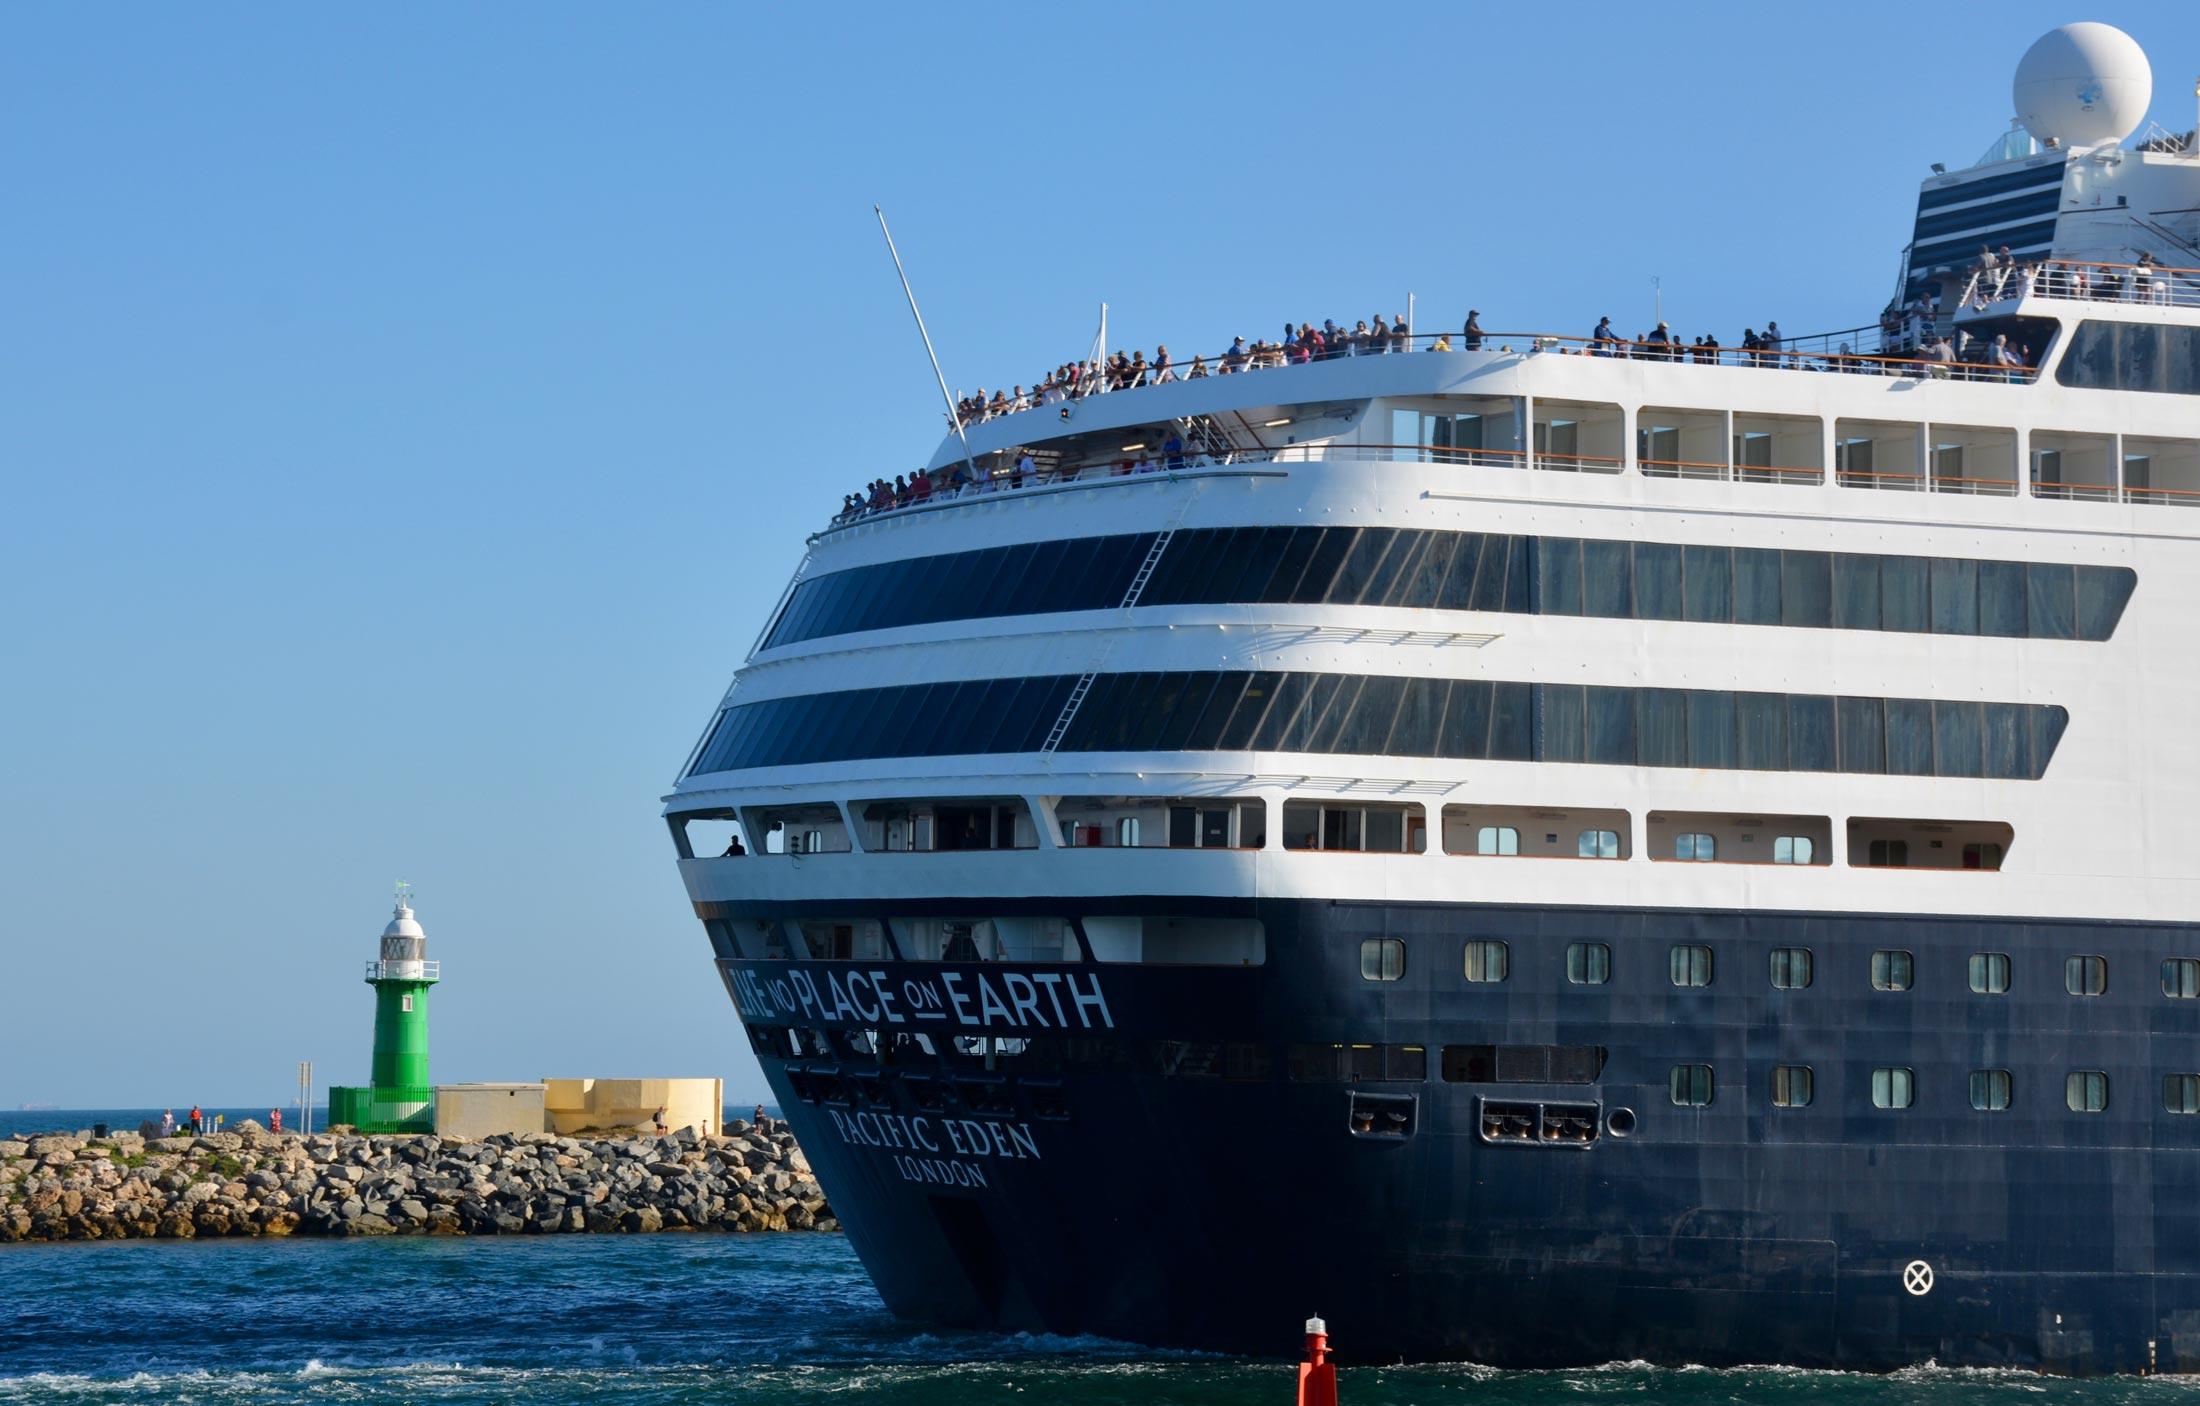 pacific-eden-fremantle-shipping-